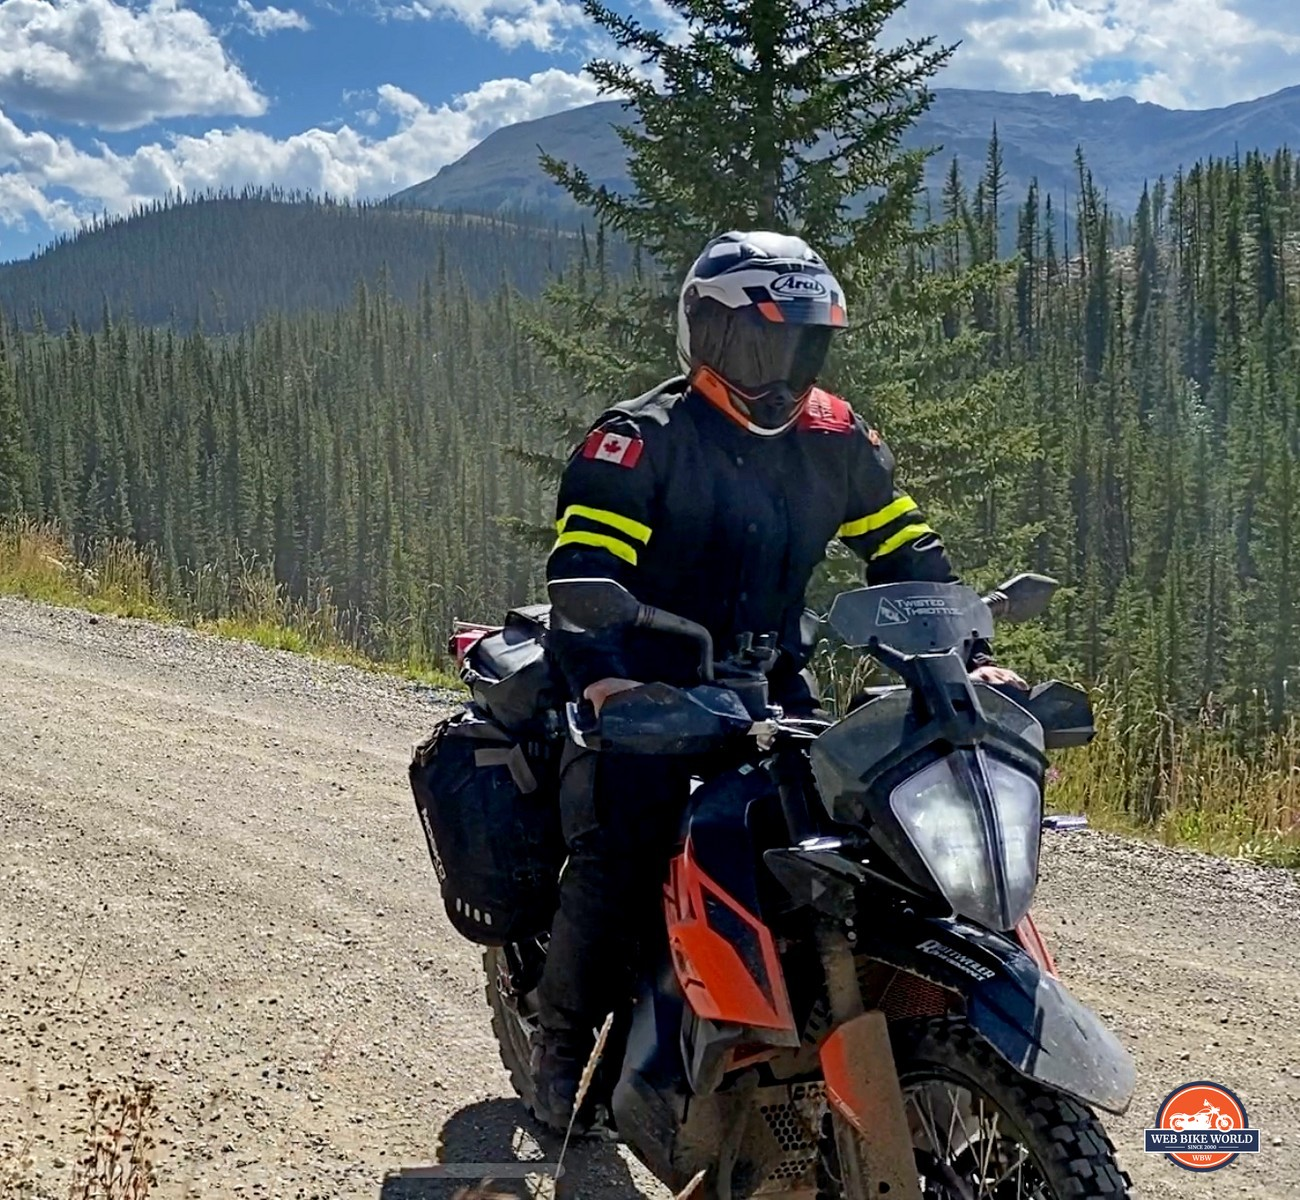 Jim Pruner riding a KTM 790 Adventure while wearing the Arai XD-4 helmet.